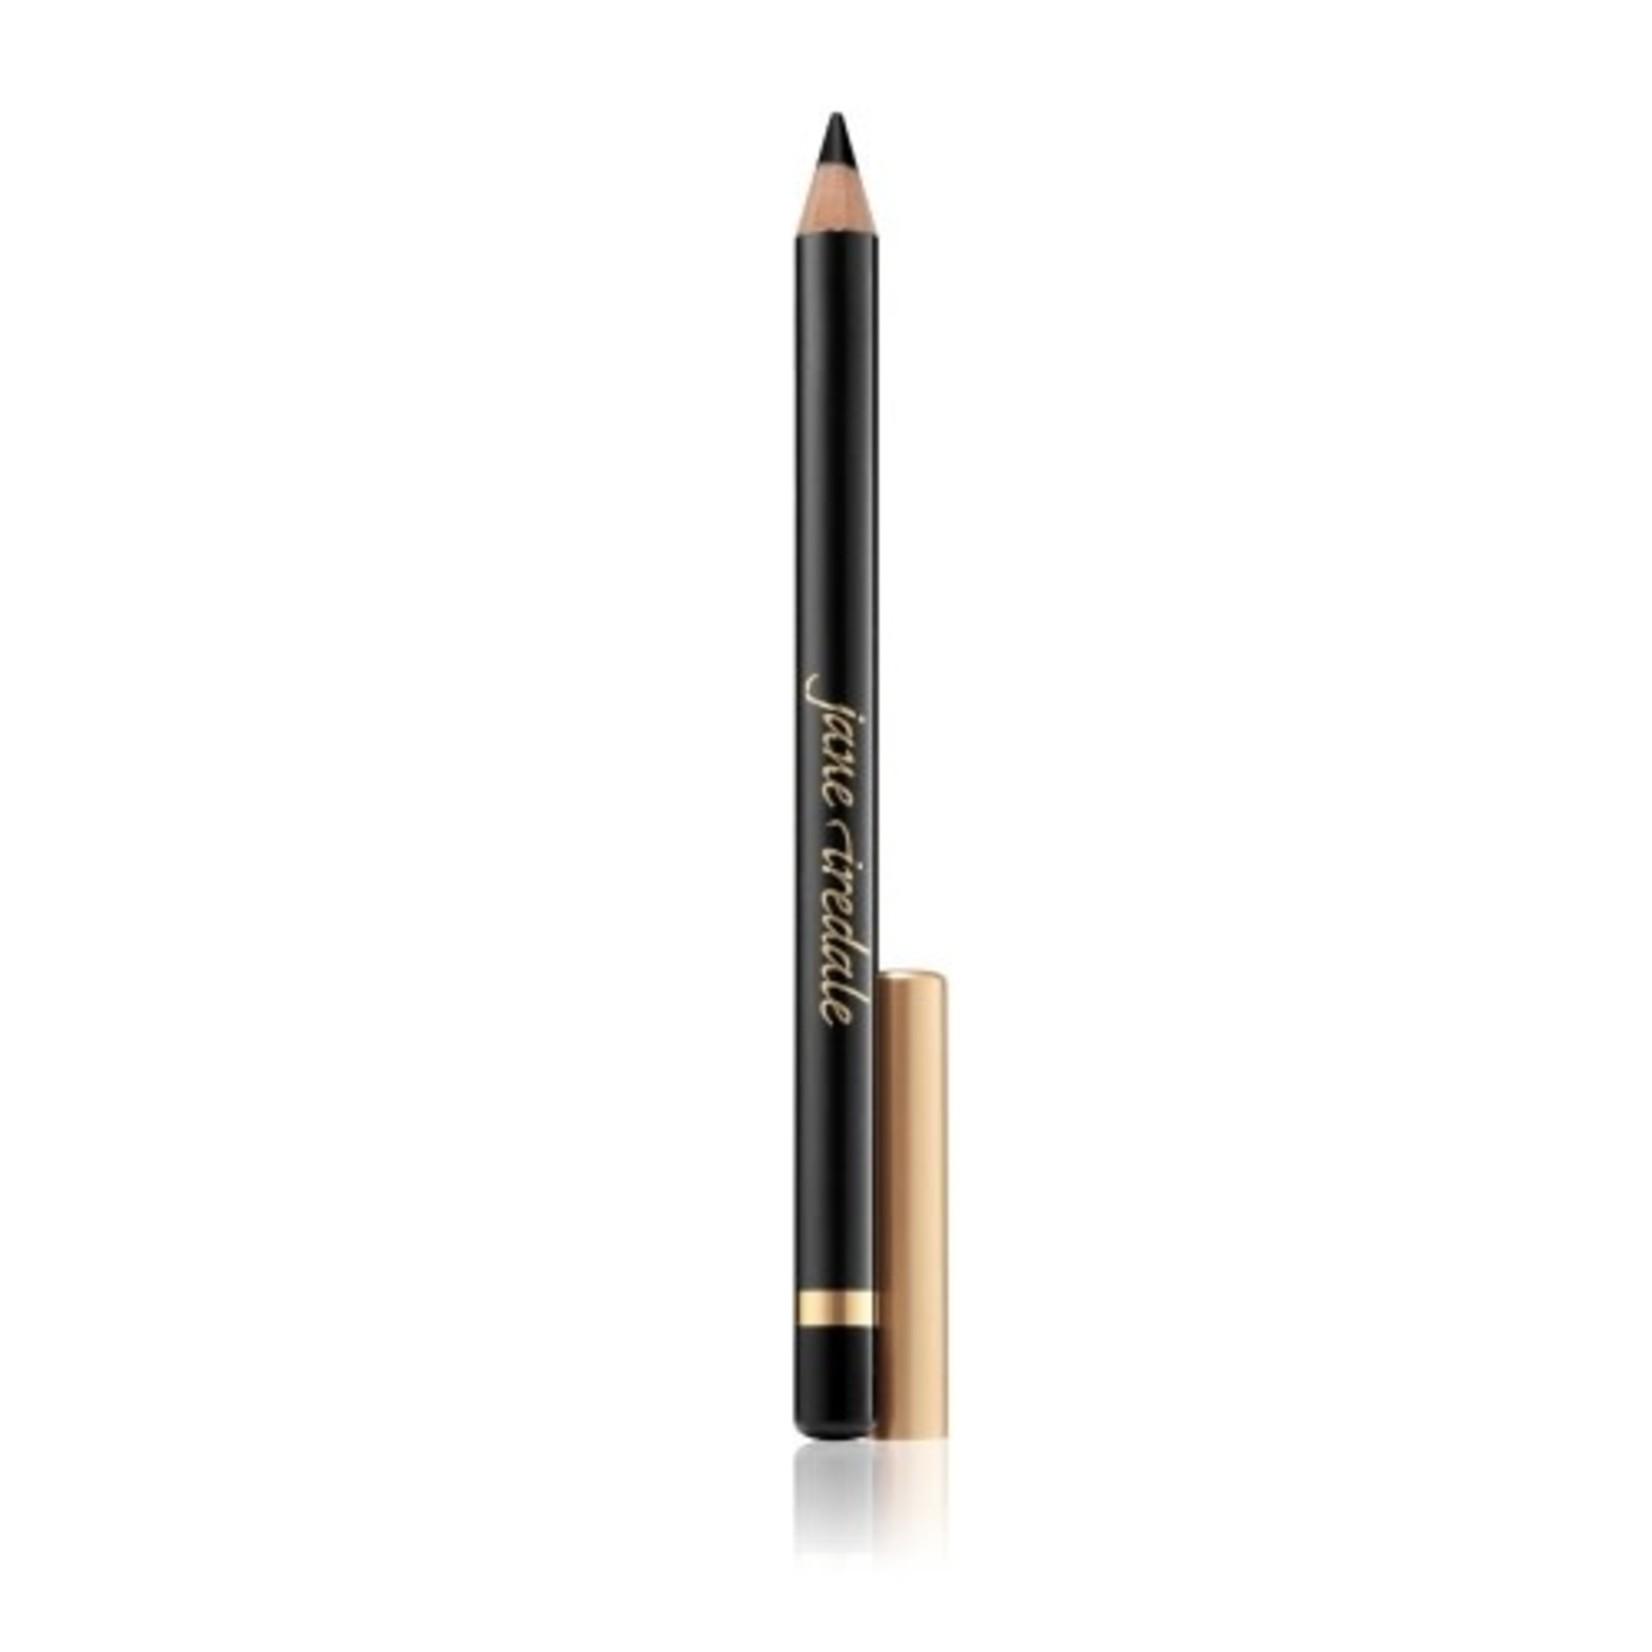 jane iredale Eye pencil basic black